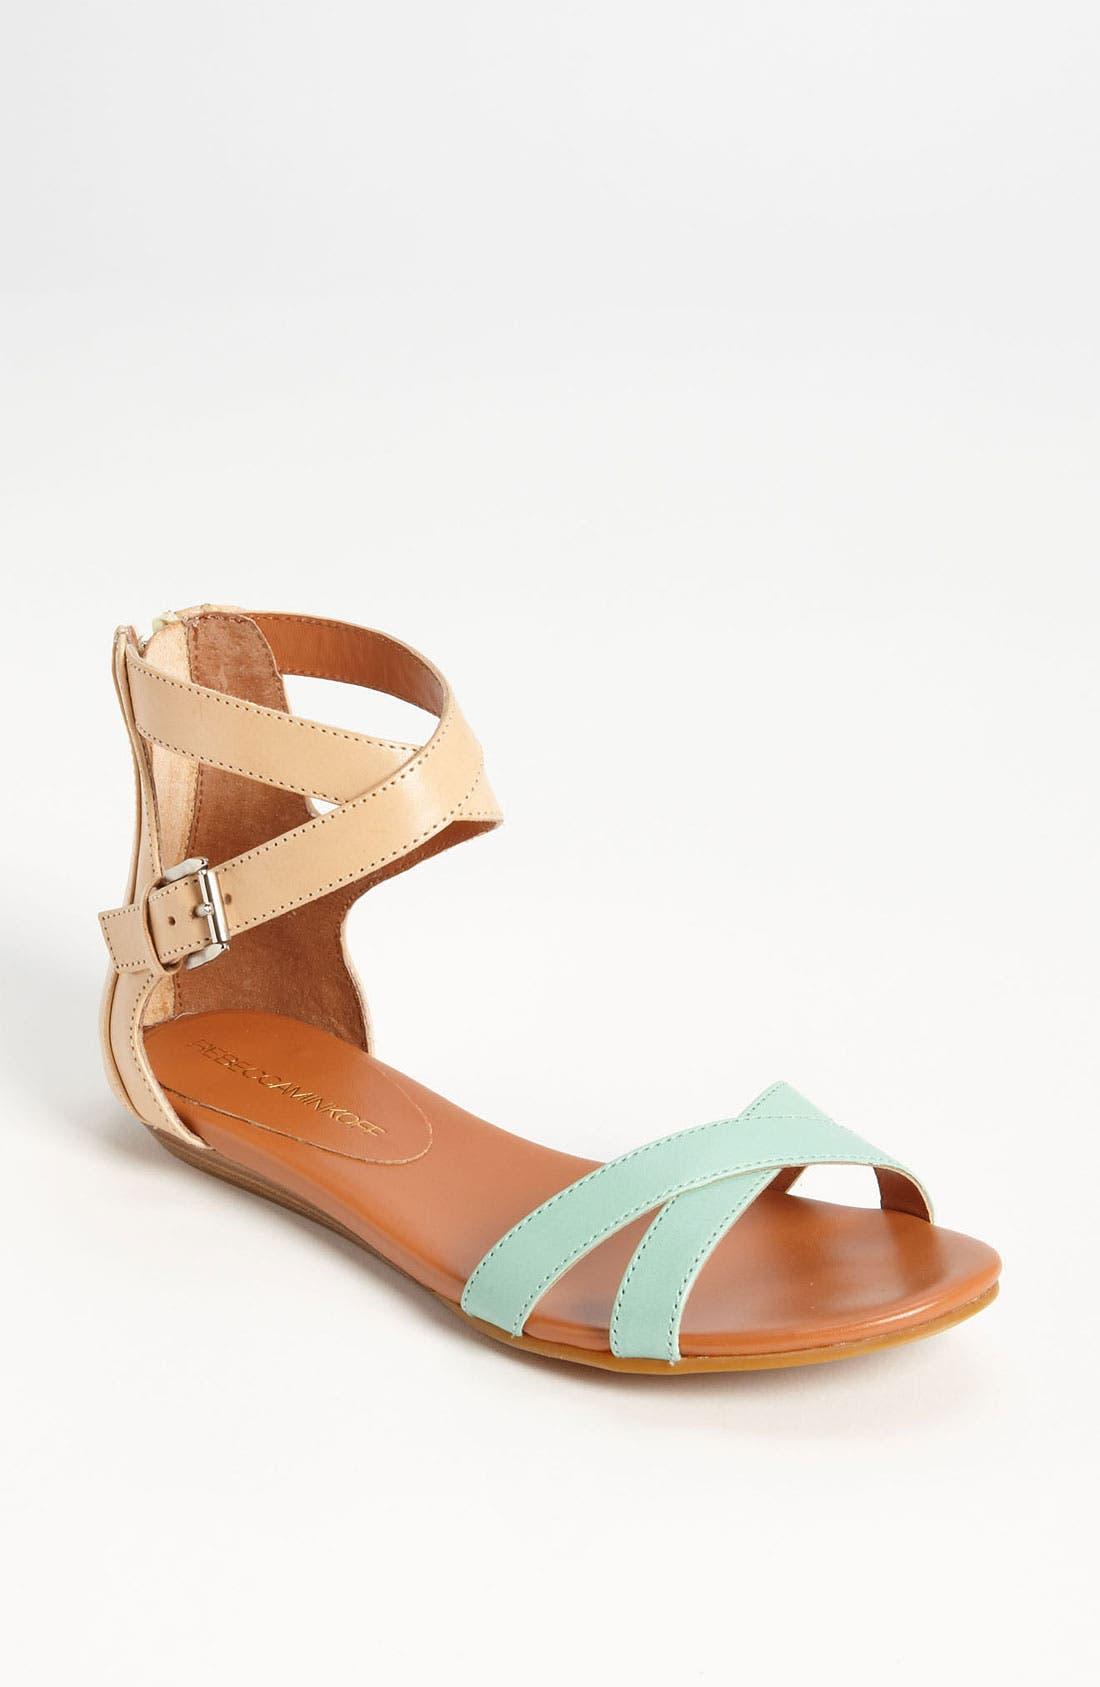 Alternate Image 1 Selected - Rebecca Minkoff 'Bettina' Sandal